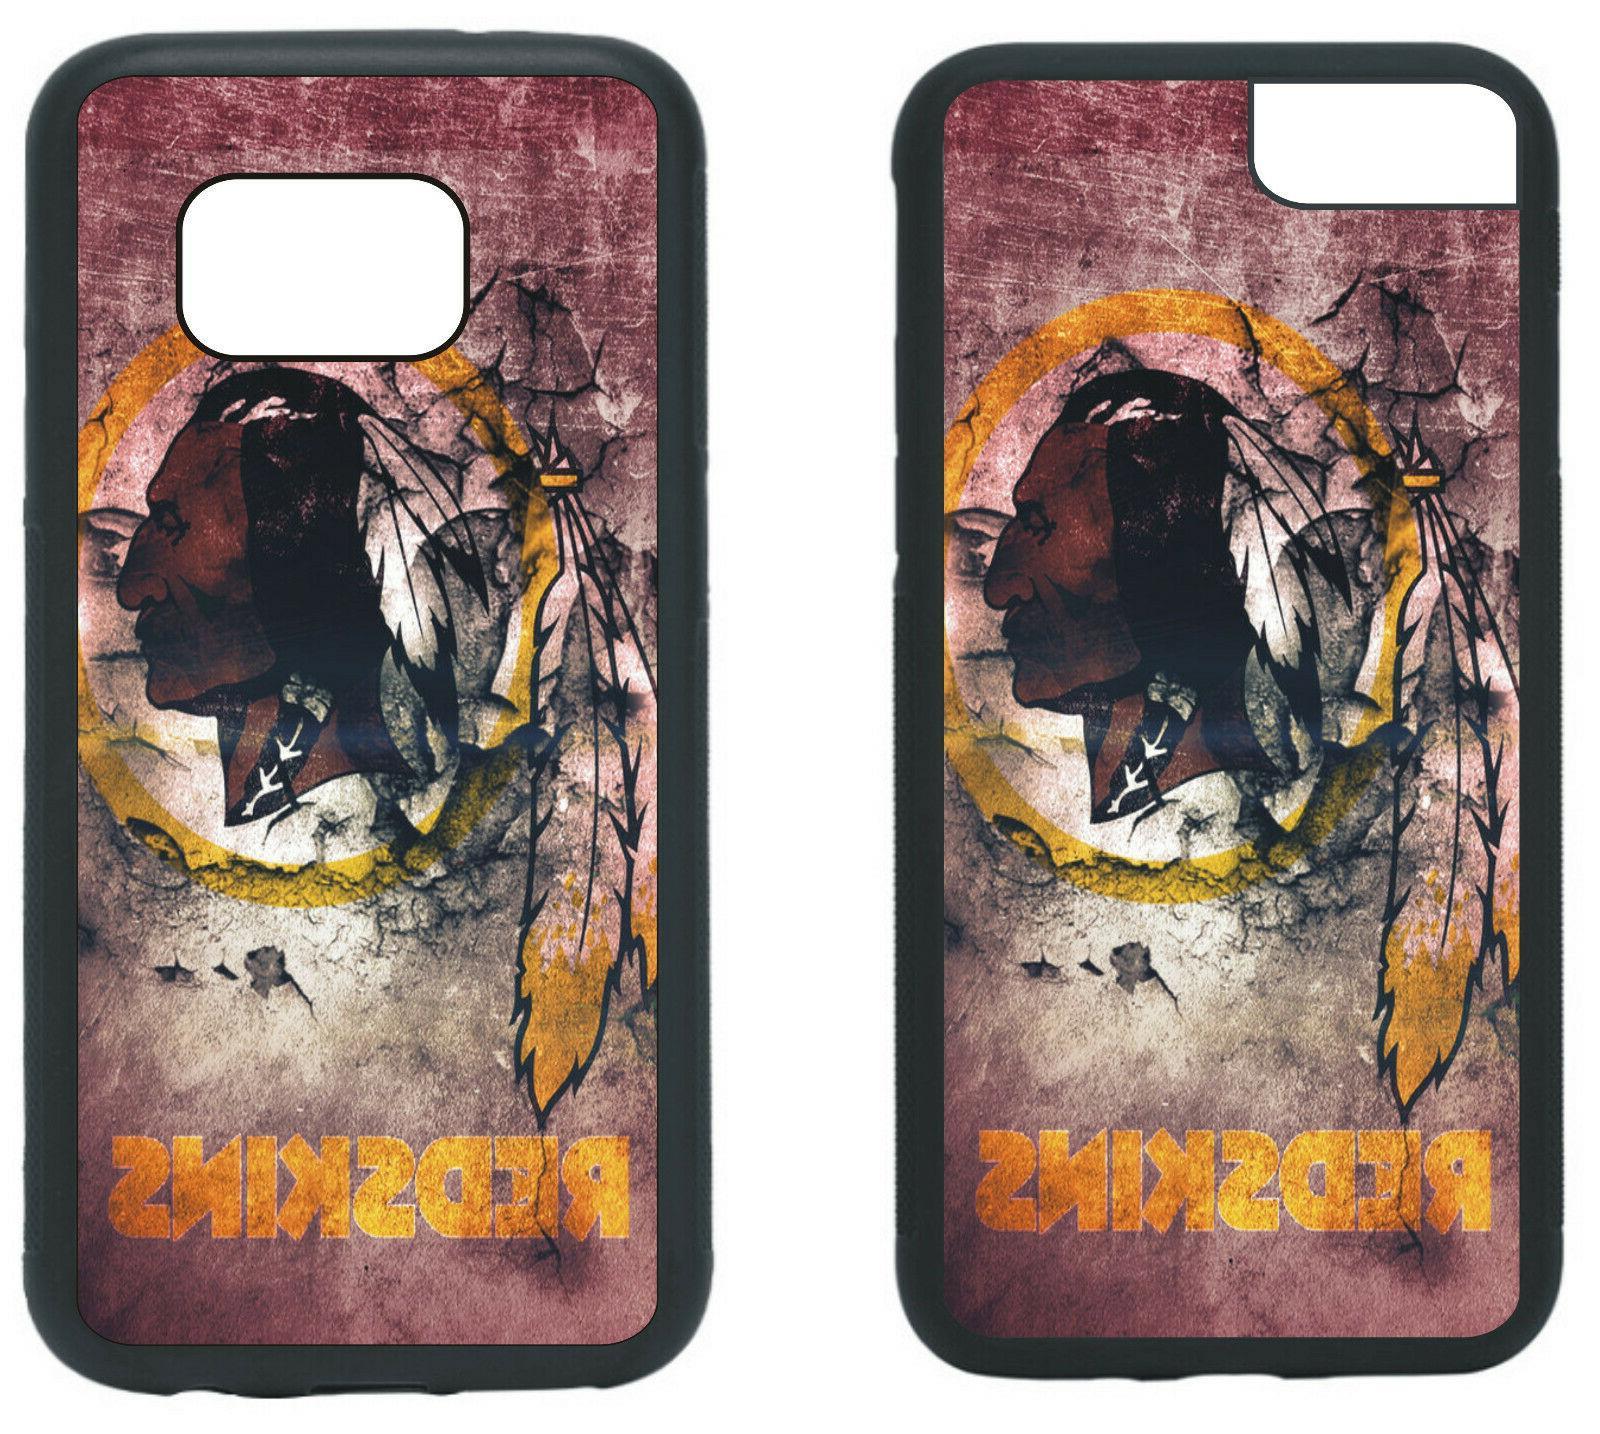 washington redskins phone case cover fits iphone